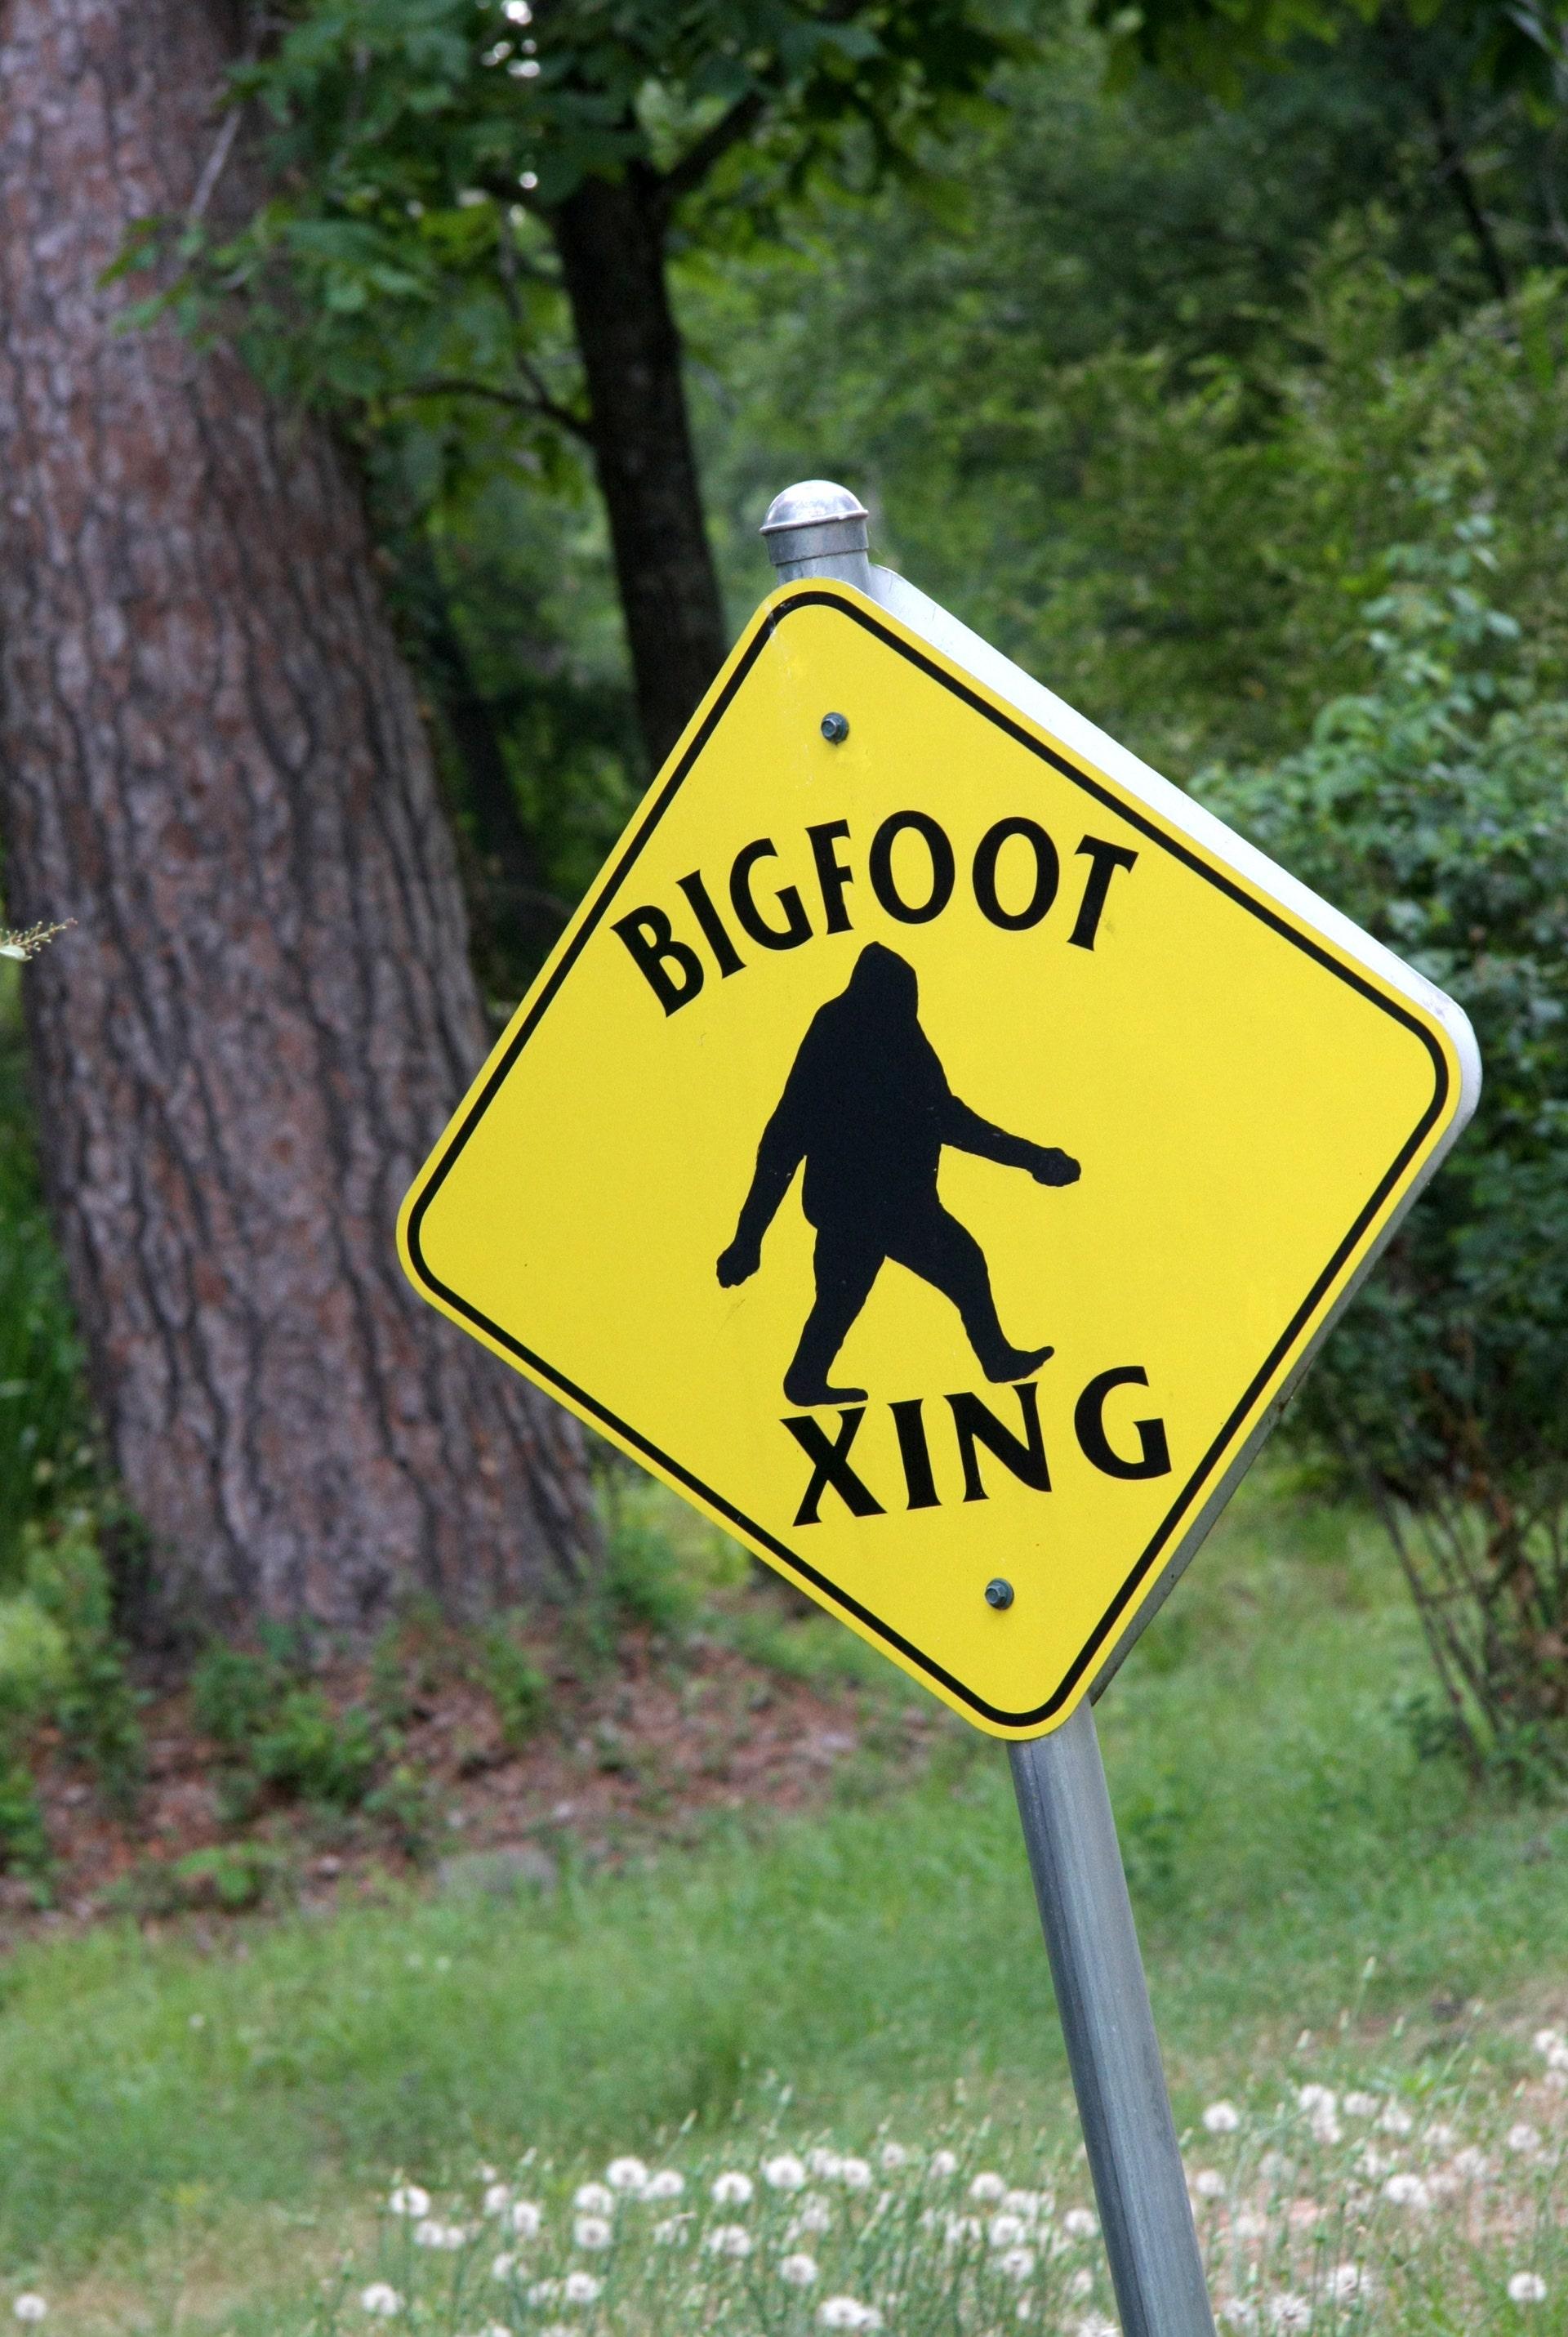 2 men claim 'Bigfoot' sighting in Ohio, video goes viral